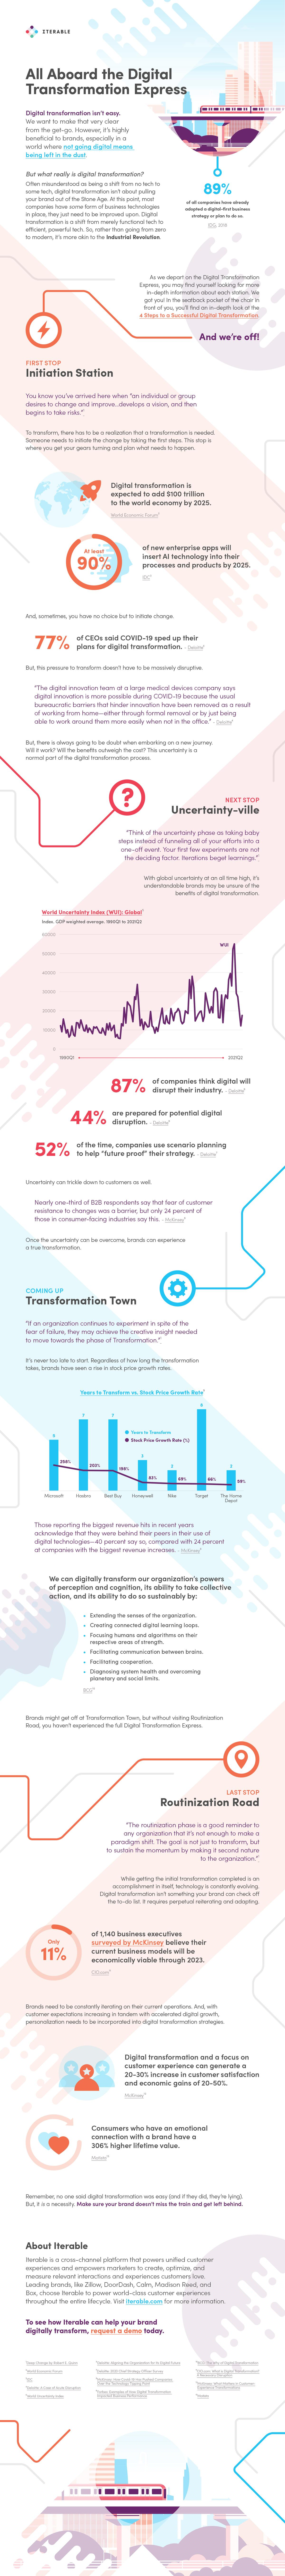 Digital Transfomation Infographic